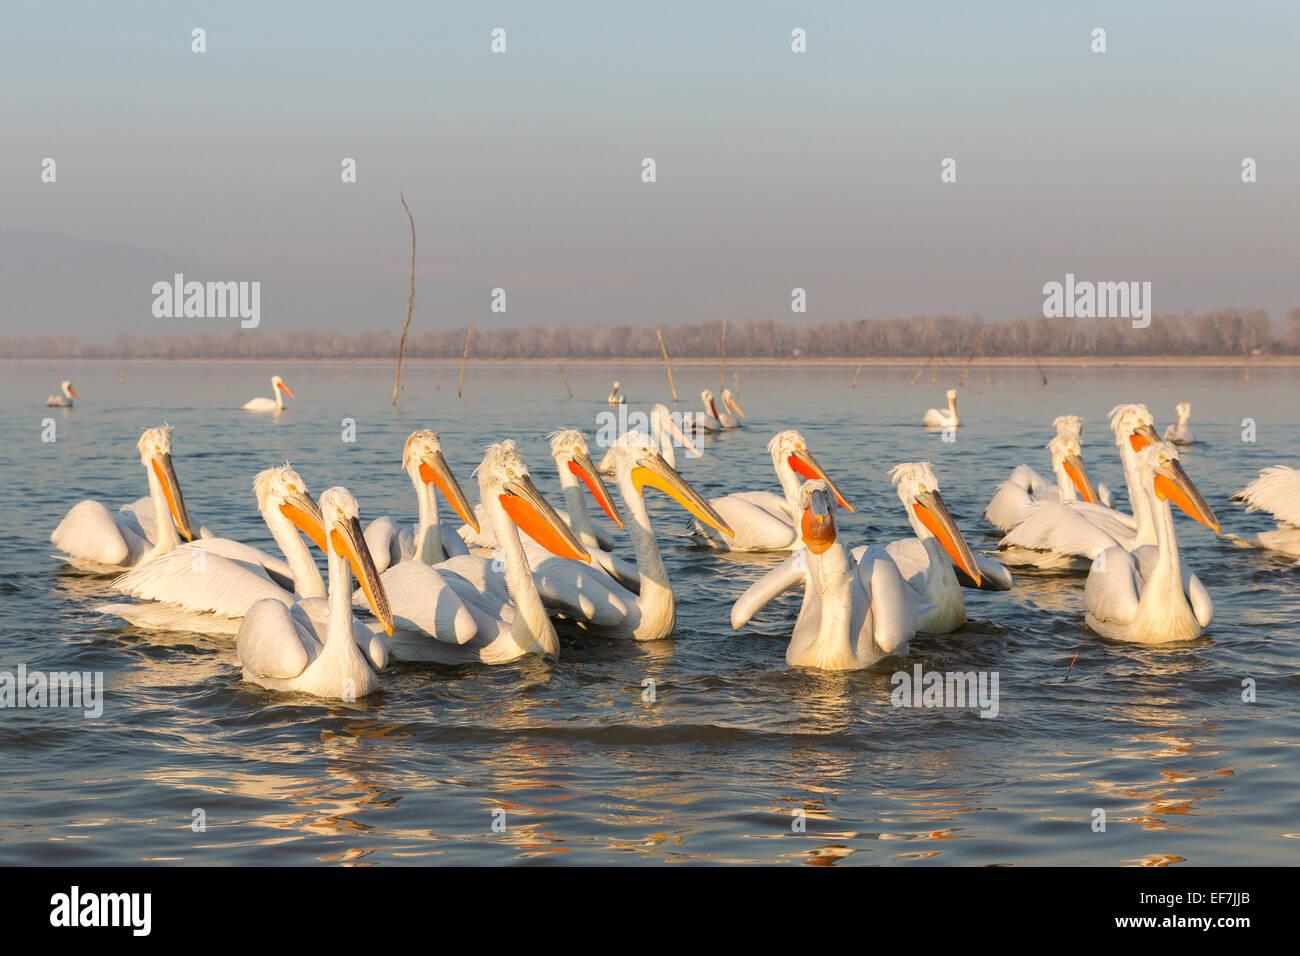 A collection of Dalmatian Pelicans (Pelecanus crispus) in golden evening sunshine on Lake Kerkini in Northern Greece - Stock Image